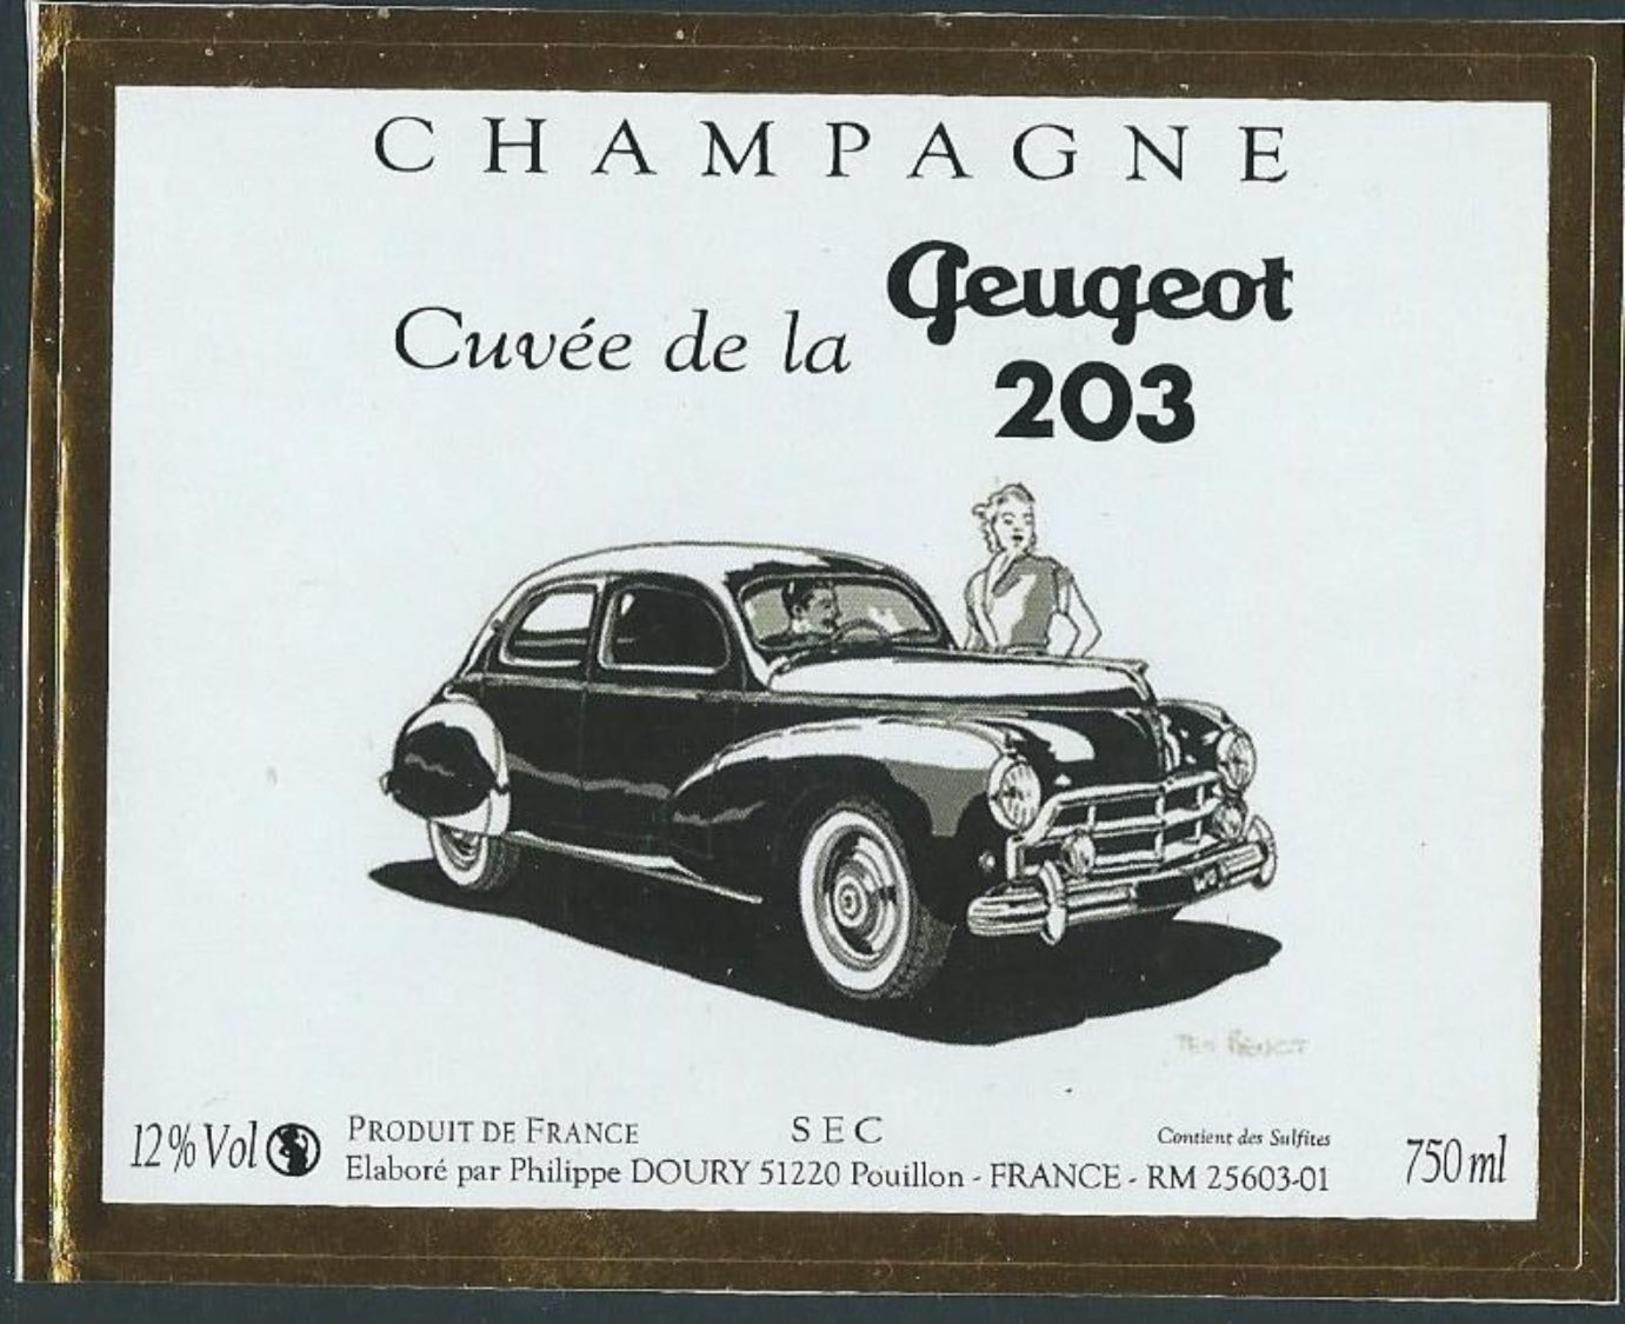 Etiquette CHAMPAGNE Thème Automobile - Champagne